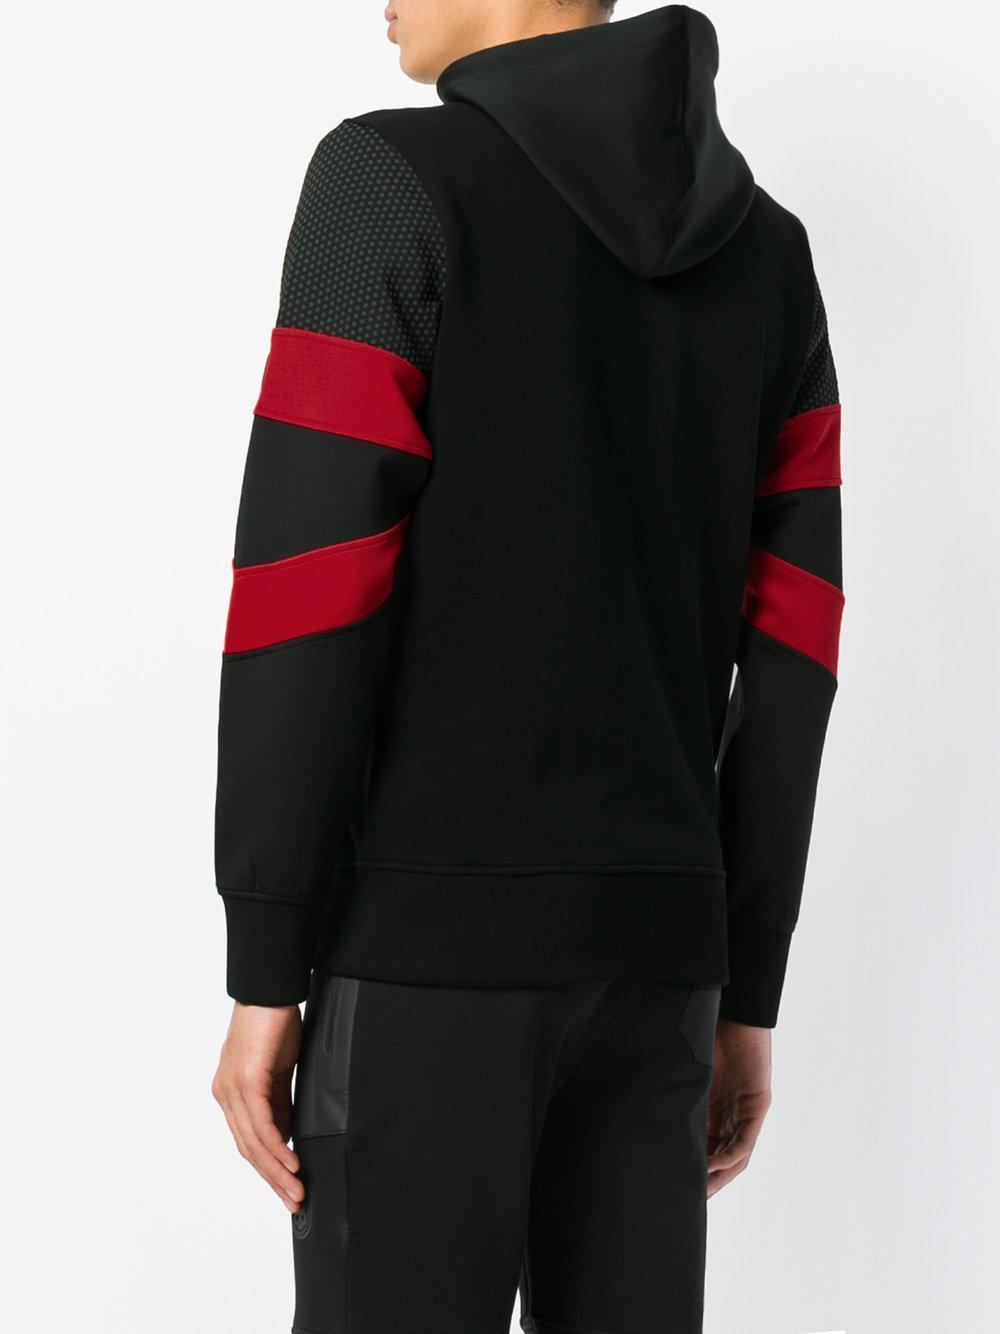 Hydrogen Cotton Panelled Sleeve Bomber Jacket in Black for Men